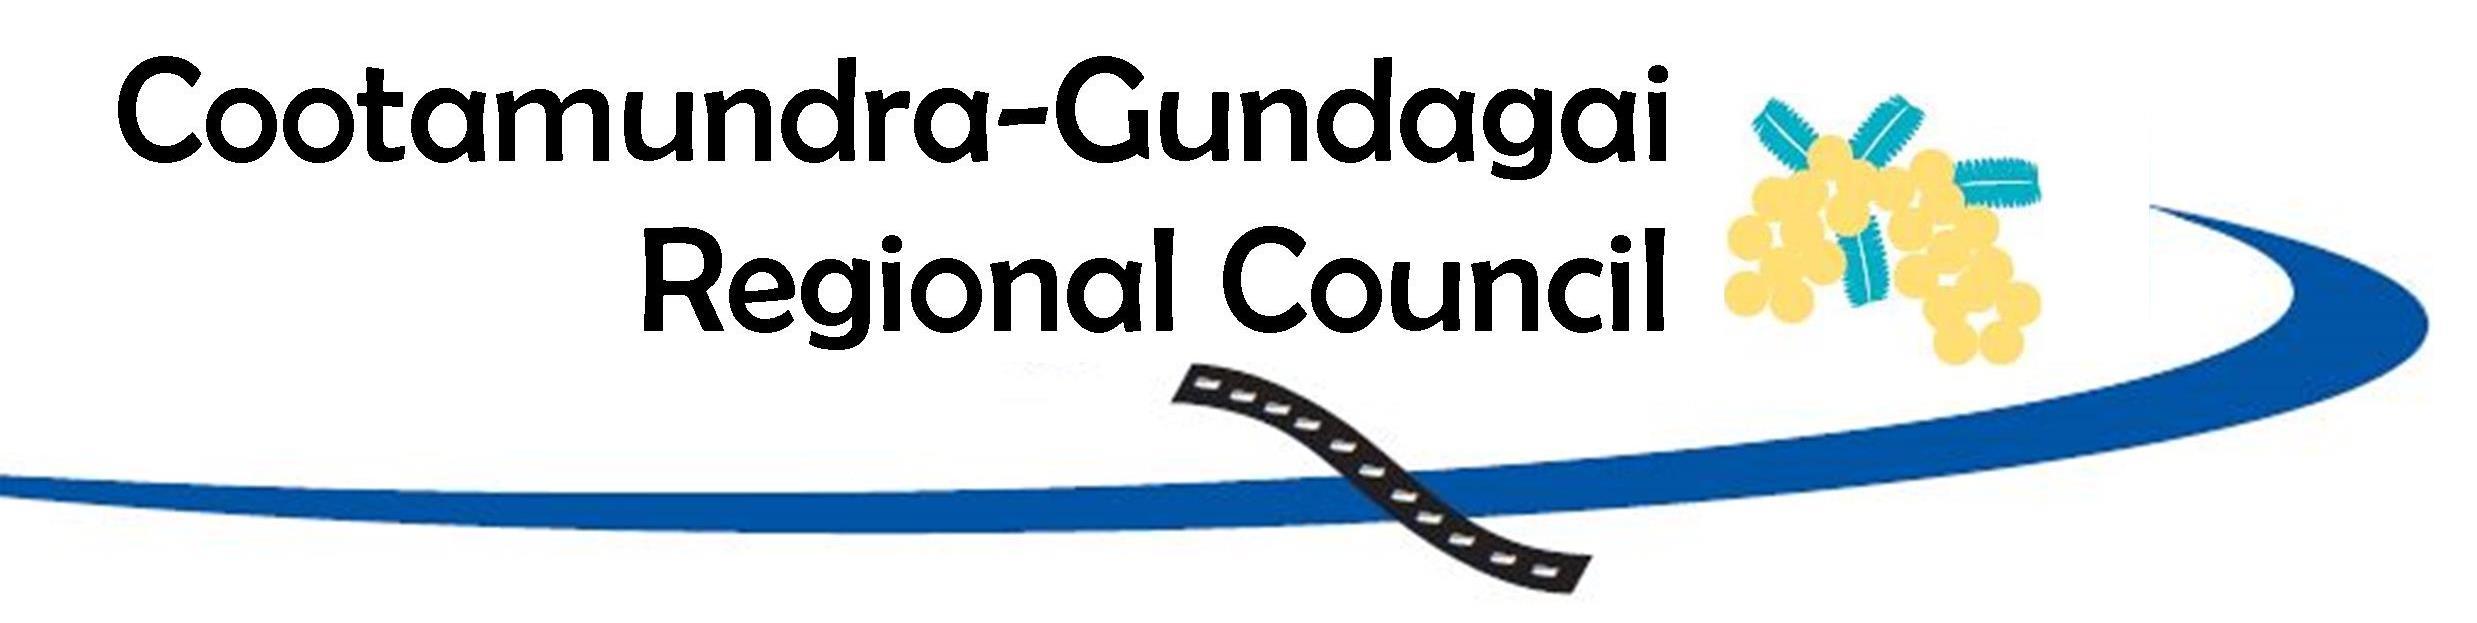 cgrc interim logo